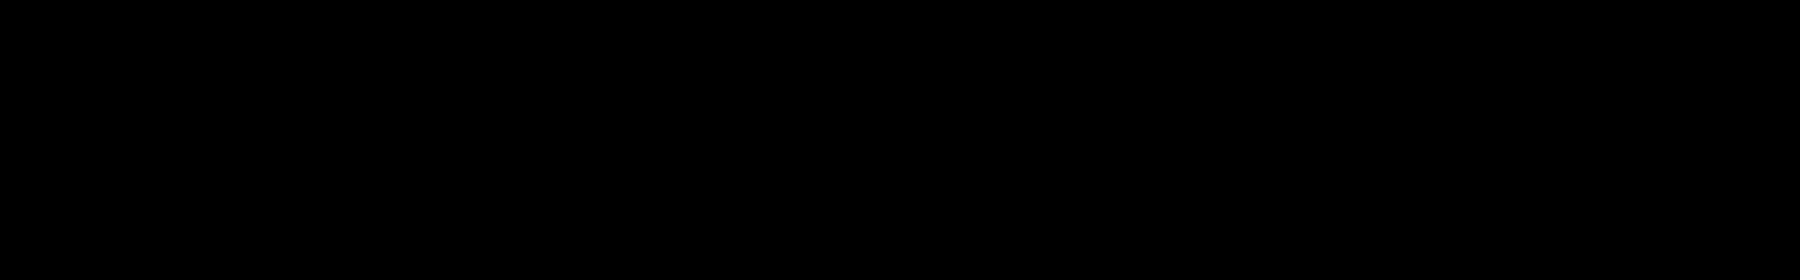 Moombahton Sounds audio waveform